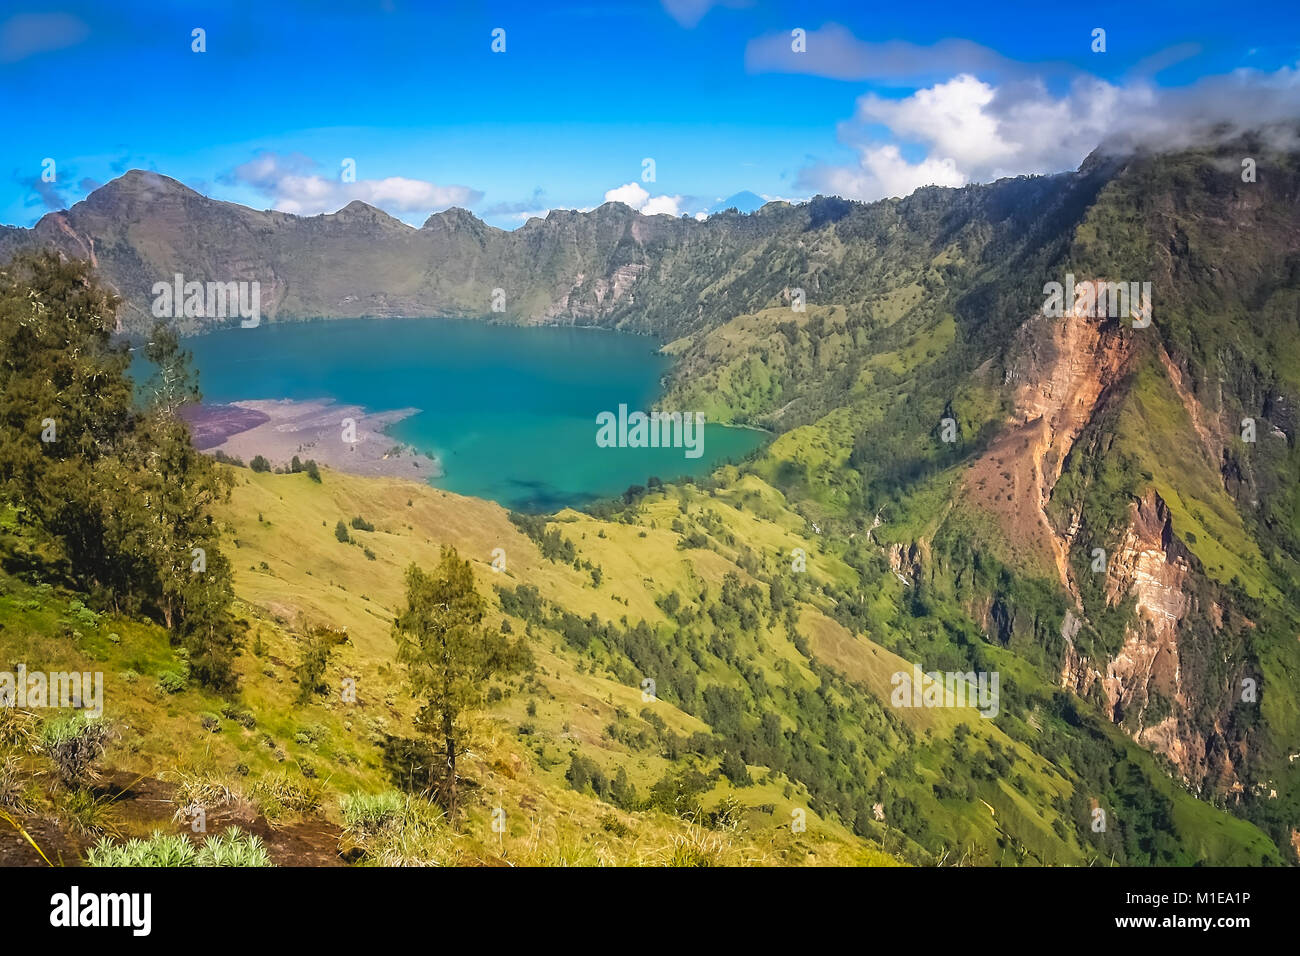 Torquise lake inside the caldera of Gunung Rinjani volcano in Lombok island,  Indonesia - Stock Image